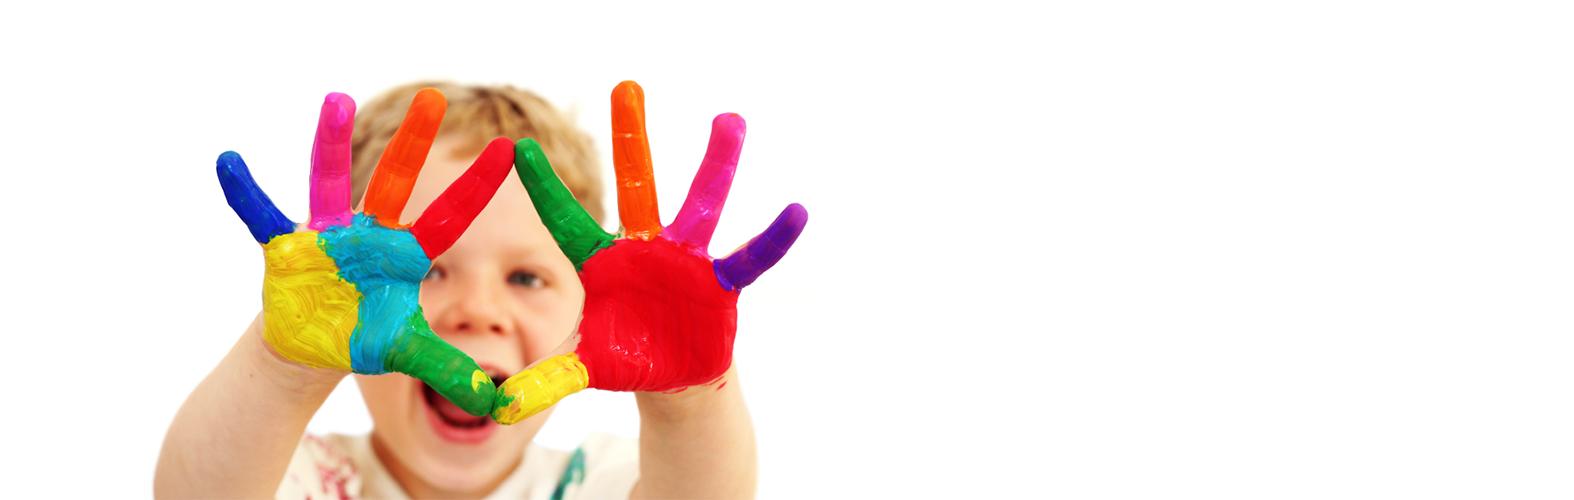 High Quality Kids Wallpaper | Full HD Images - Children HD PNG